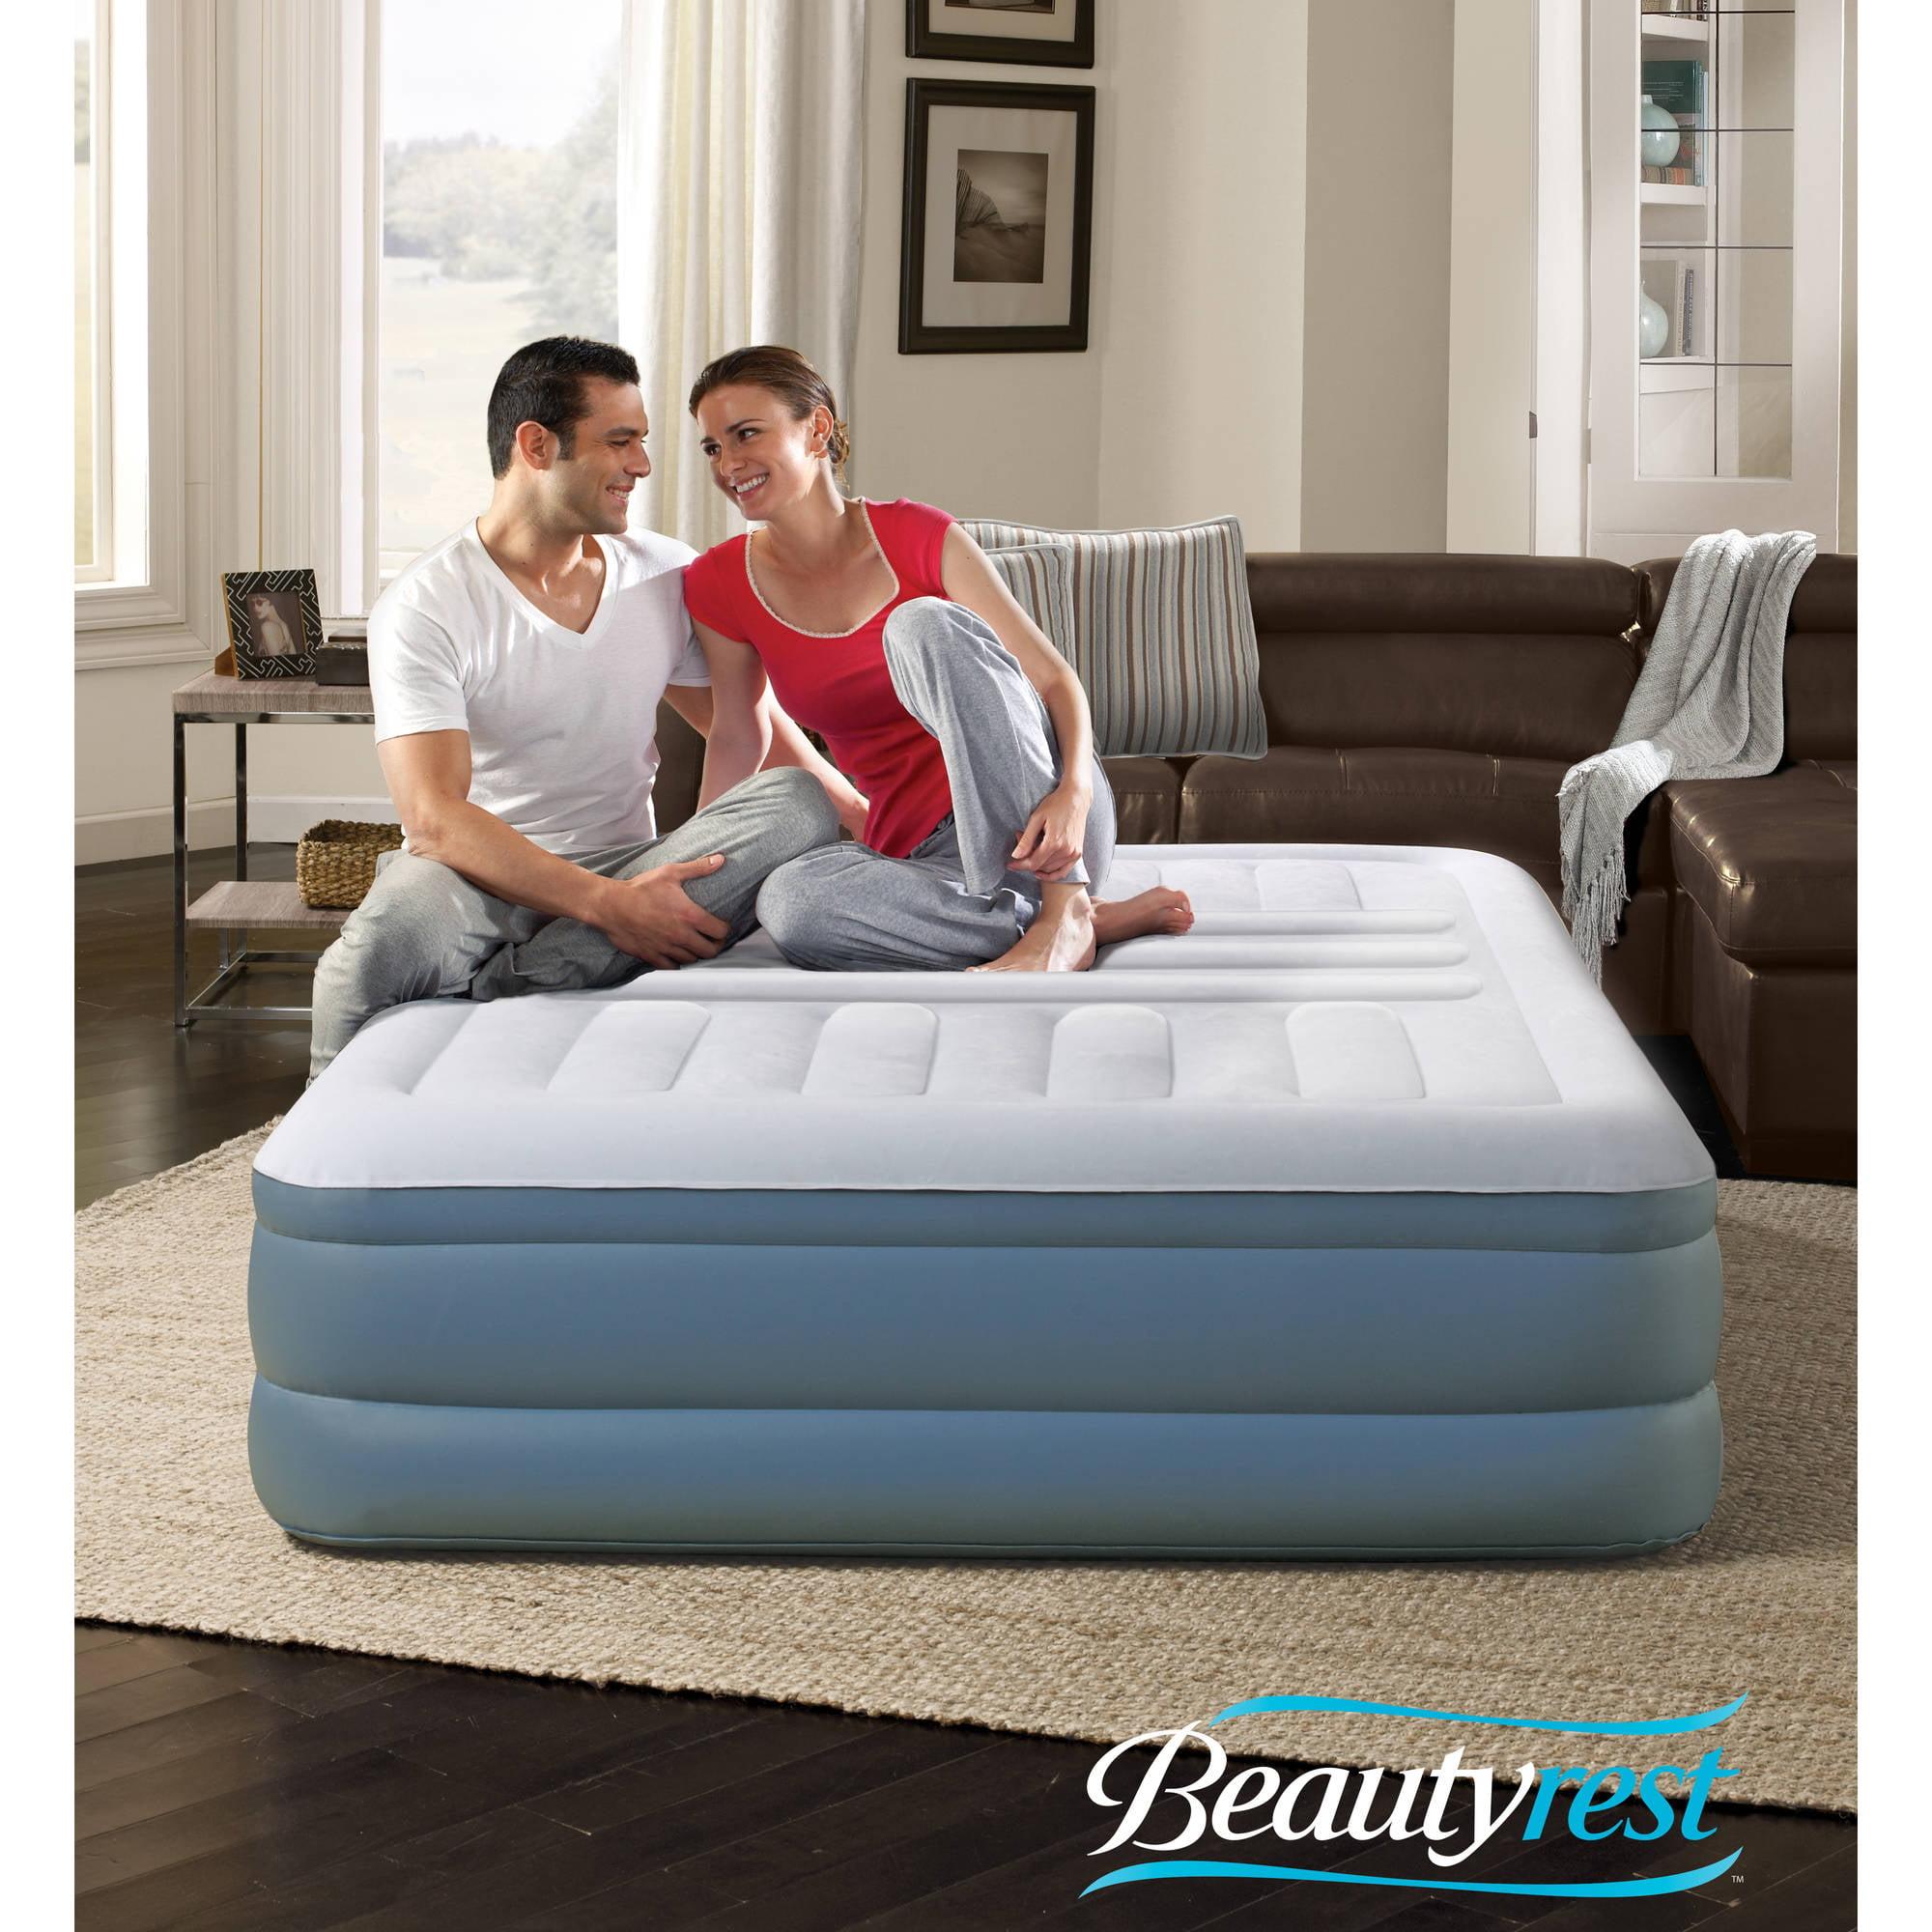 Simmons Beautyrest Lumbar Lux Queen Raised Air Bed